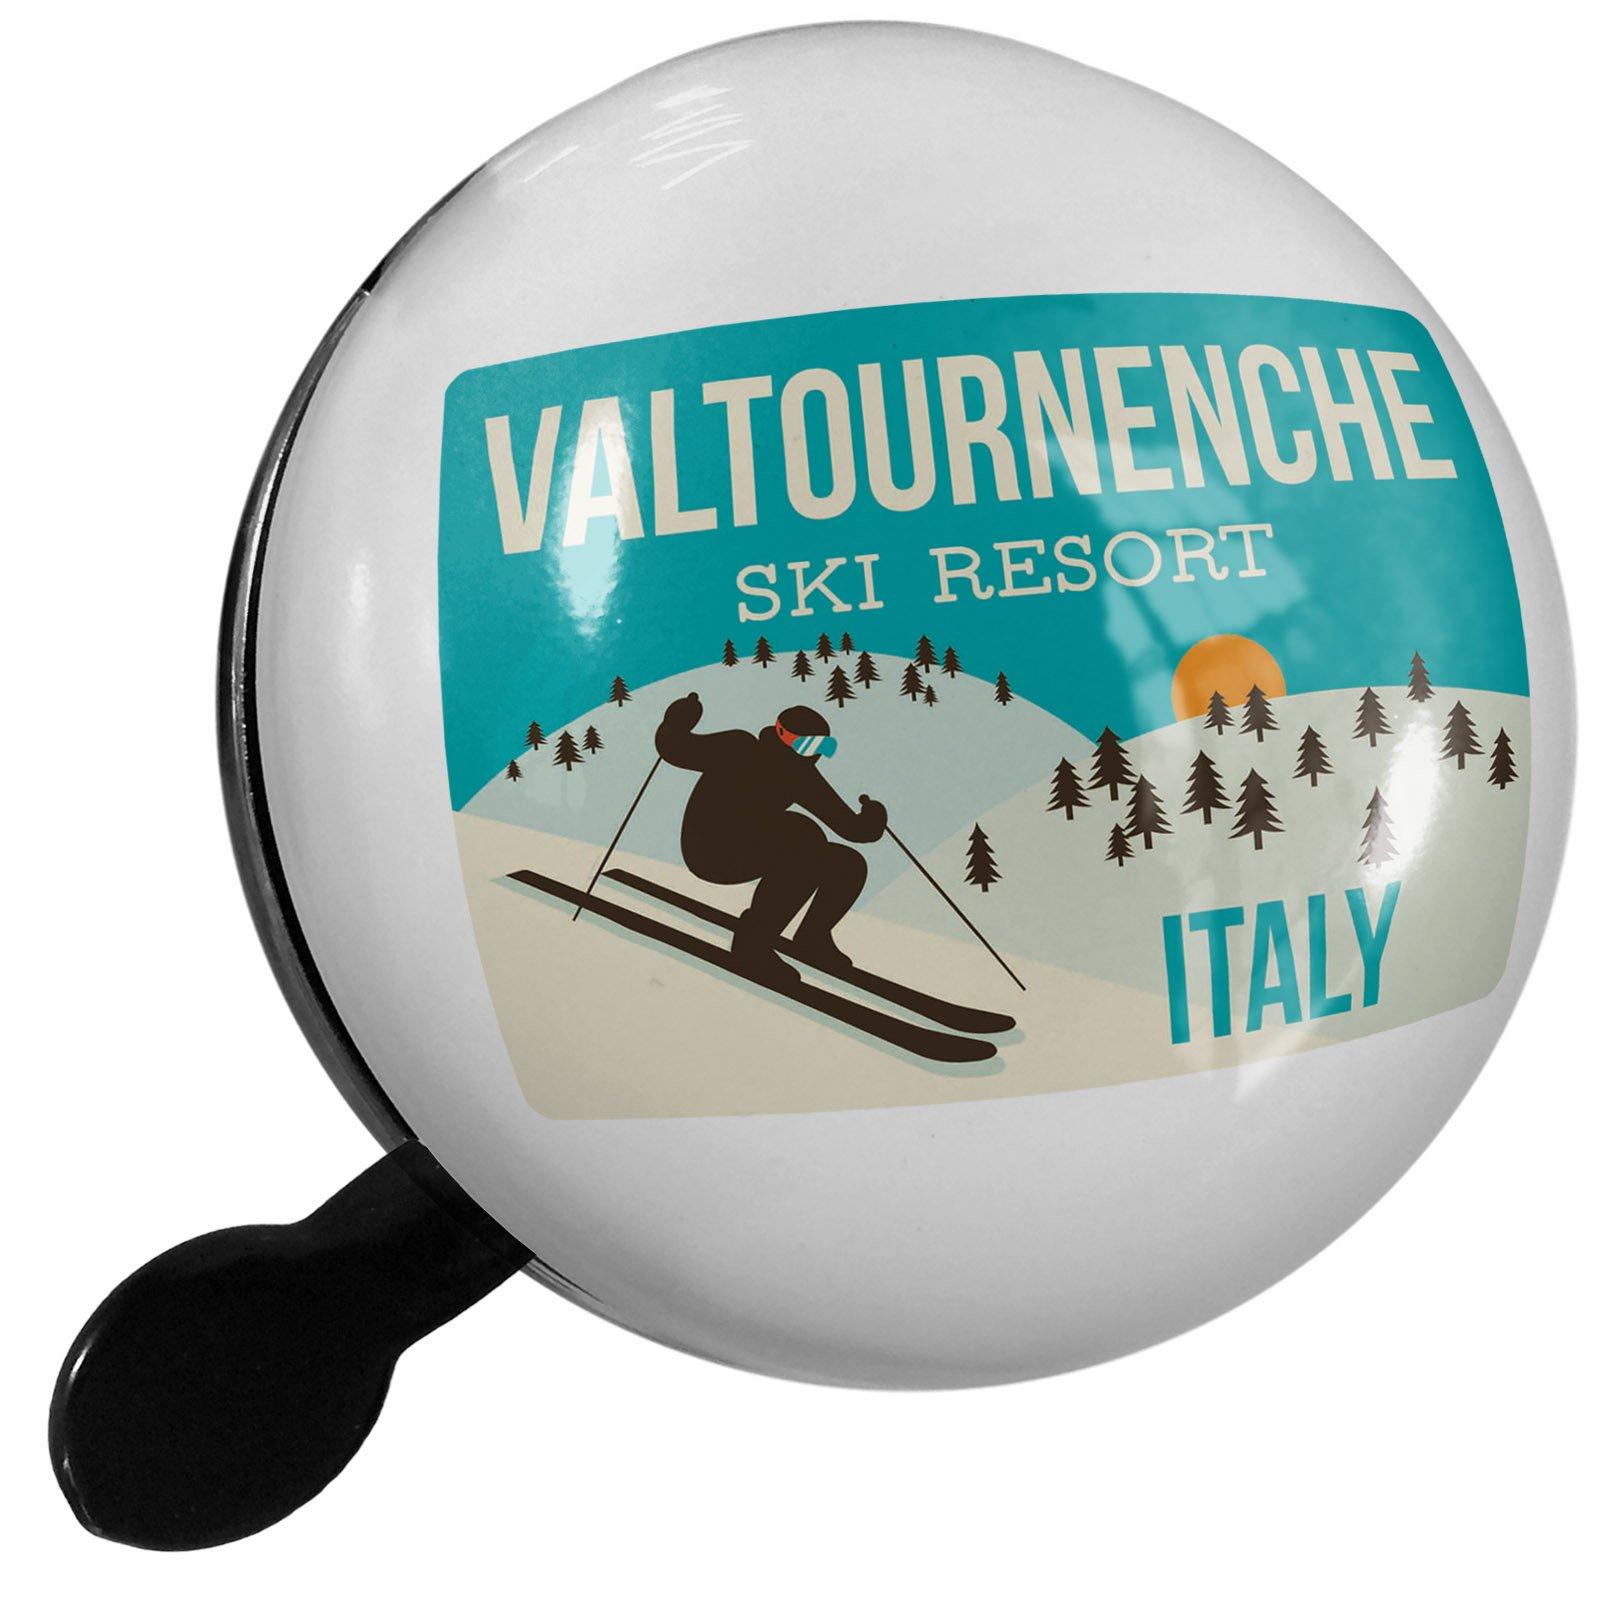 Small Bike Bell Valtournenche Ski Resort - Italy Ski Resort - NEONBLOND